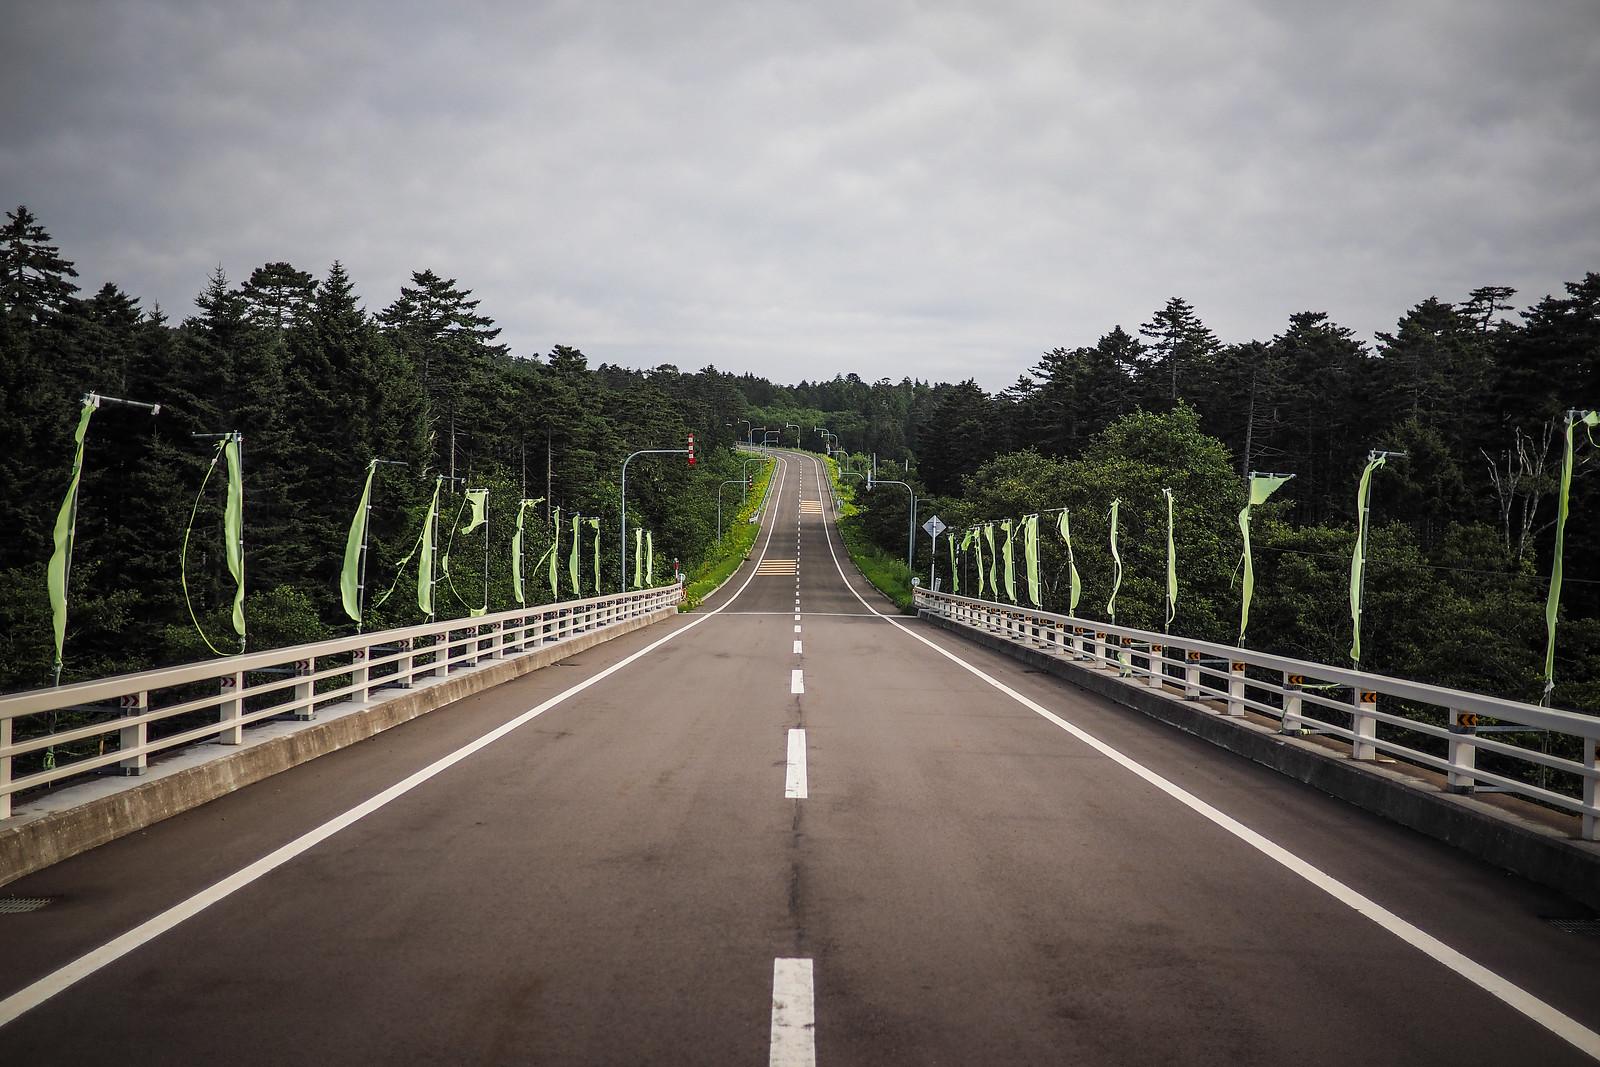 Equally quiet roads along the coast near Konbumori, Hokkaido, Japan